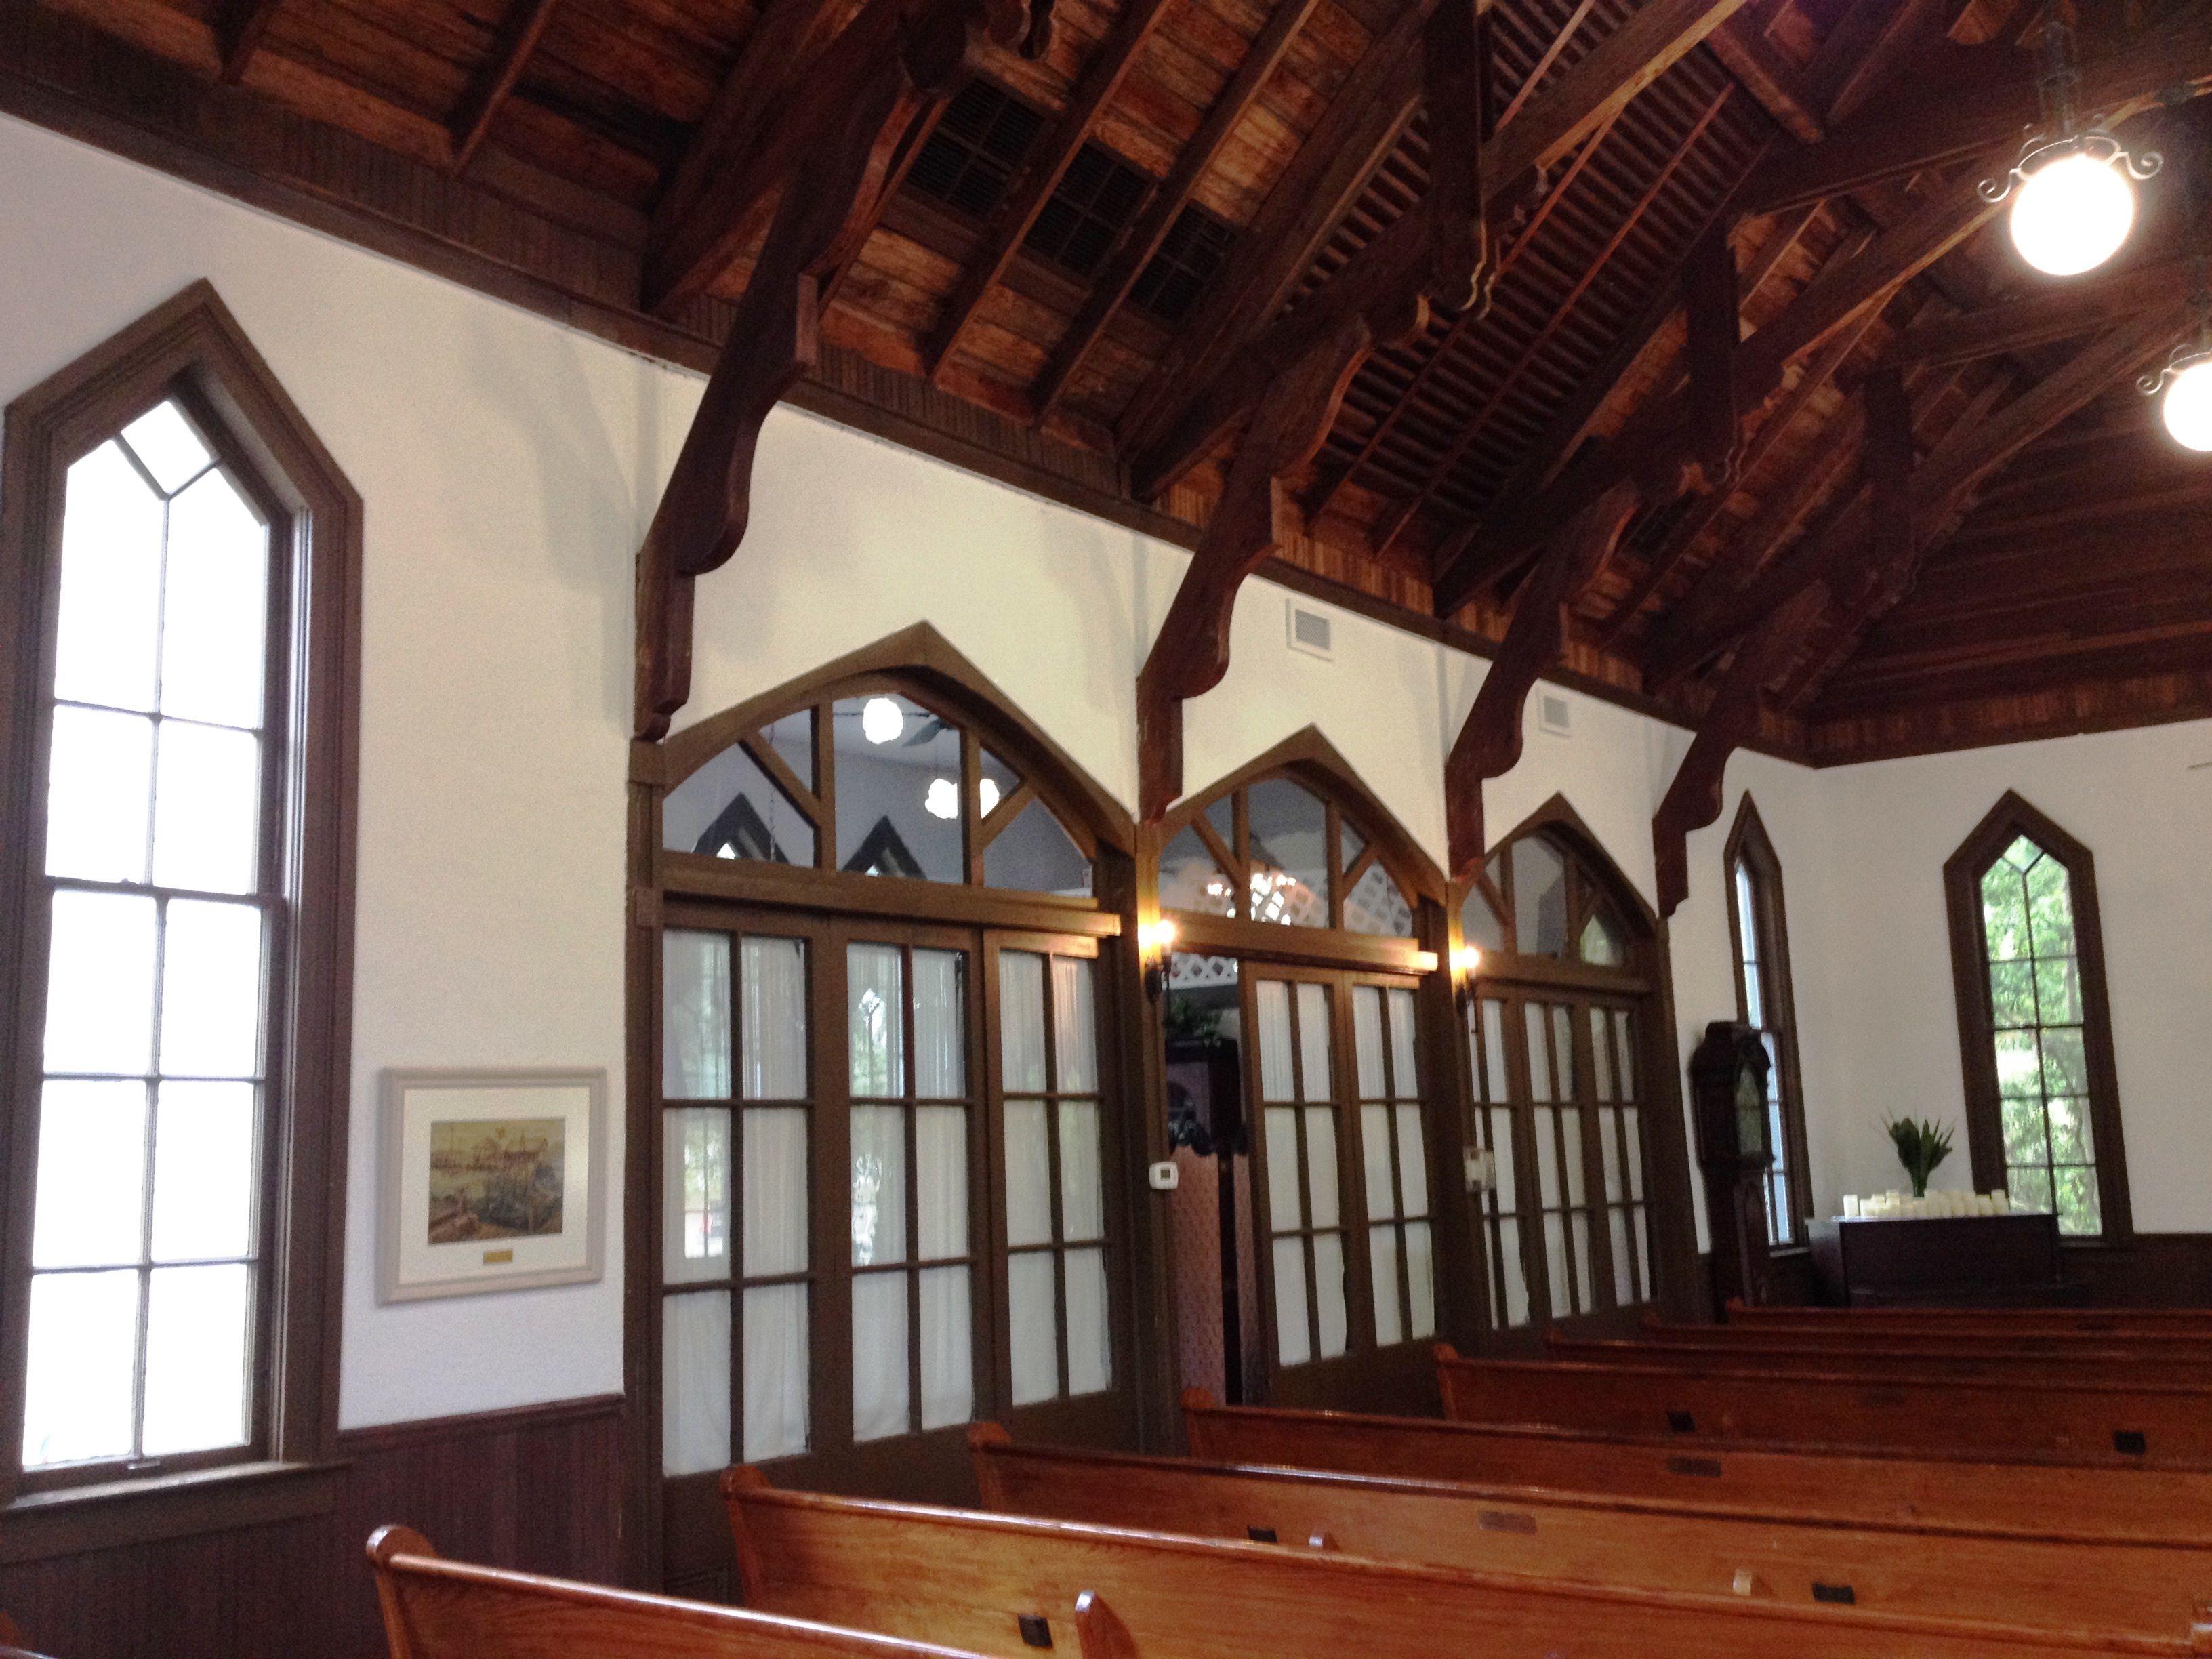 Renewing Your Vows Venue West Orange: Historic St Andrews Memorial Chapel